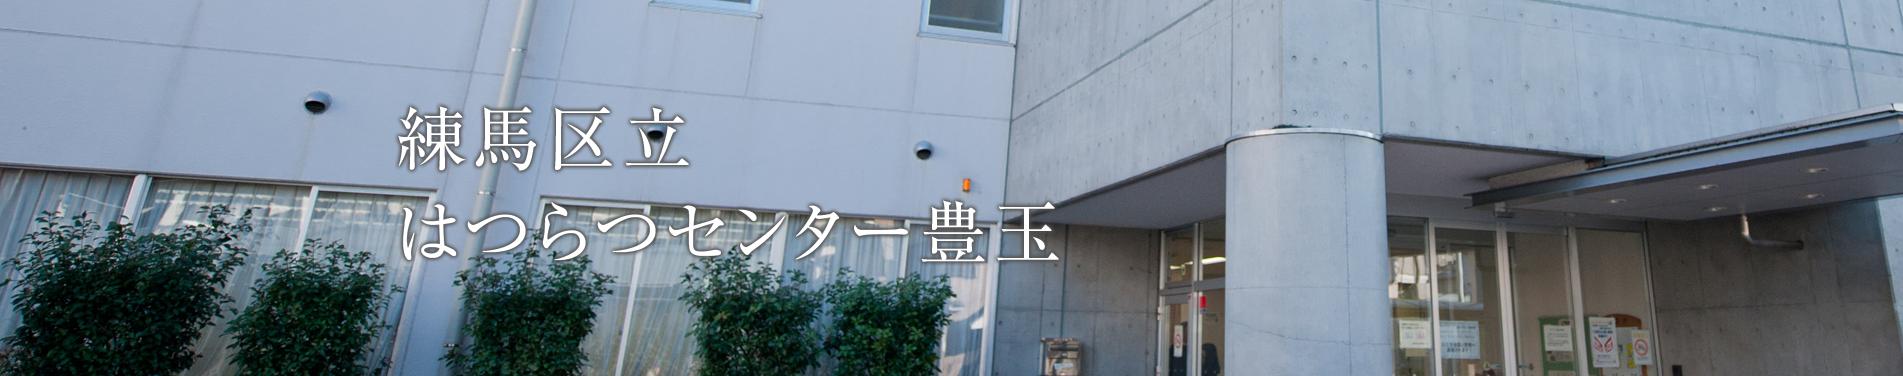 練馬区立豊玉高齢者センター